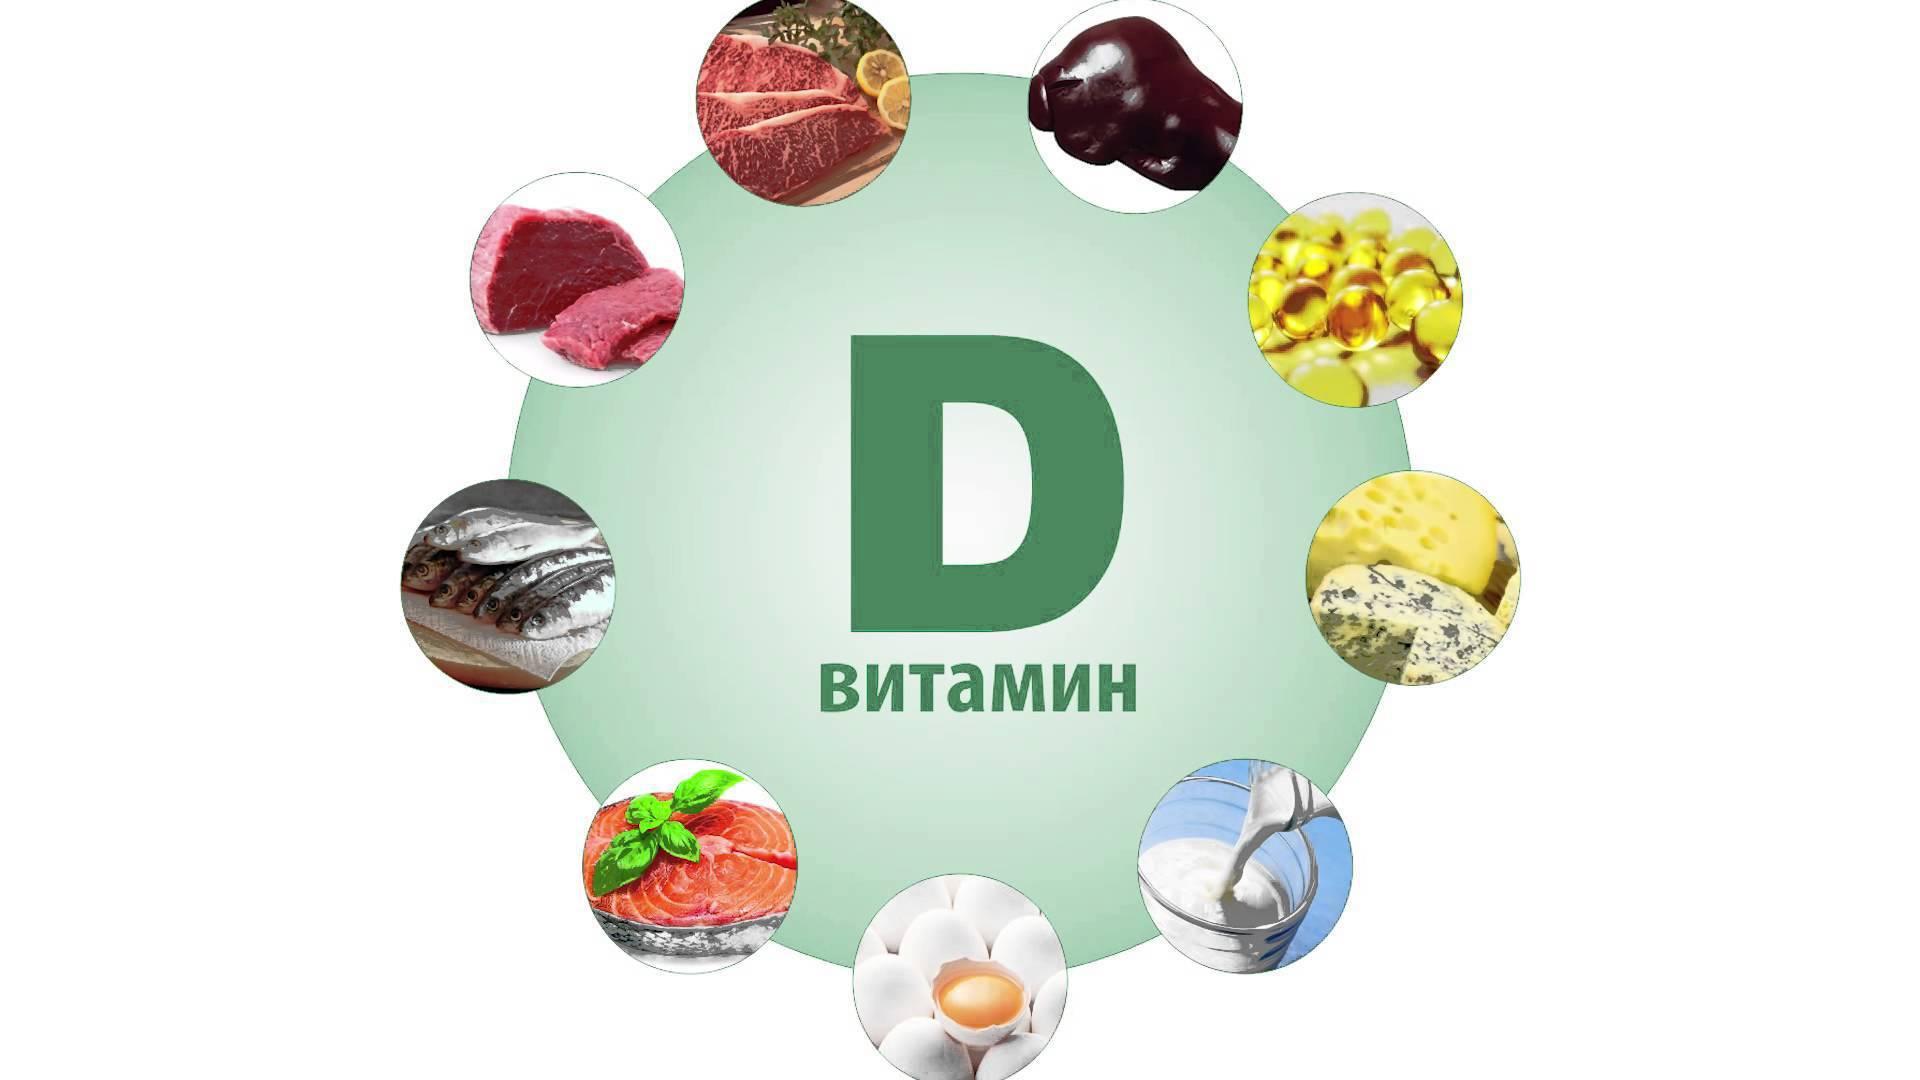 Витамин д для мужской потенции в таблетках